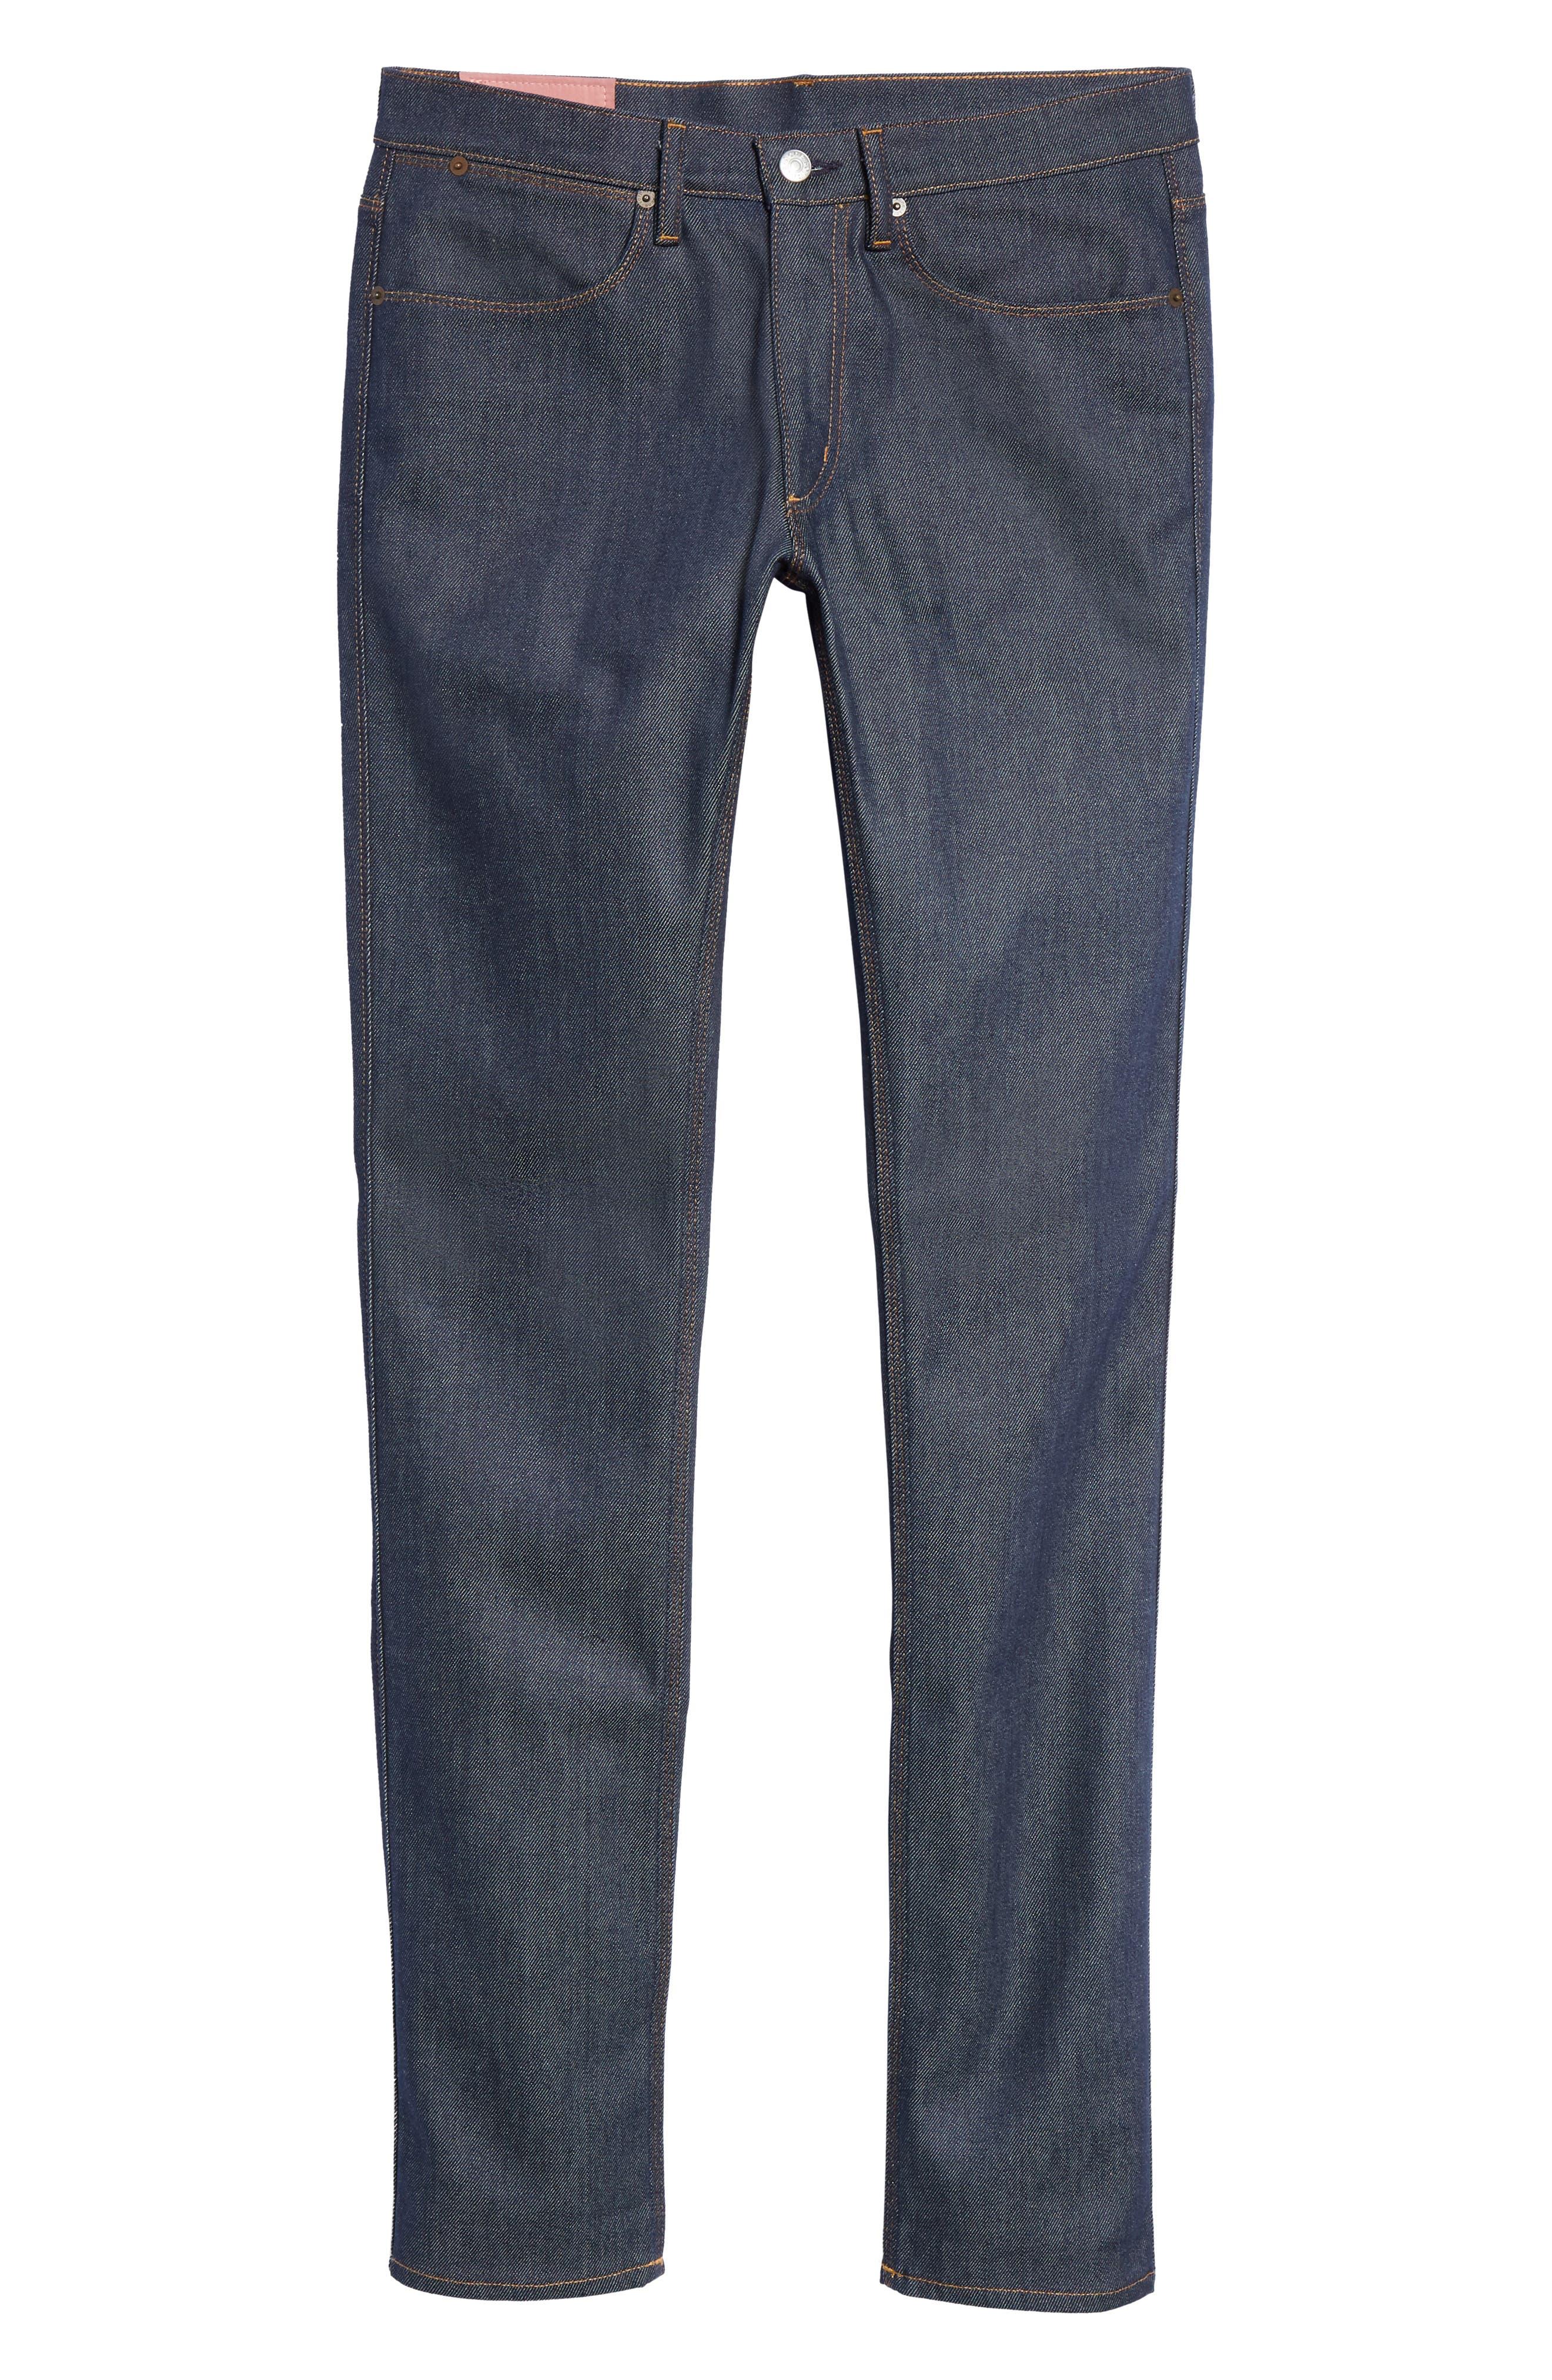 Max Slim Straight Leg Jeans,                             Alternate thumbnail 6, color,                             MAX INDIGO